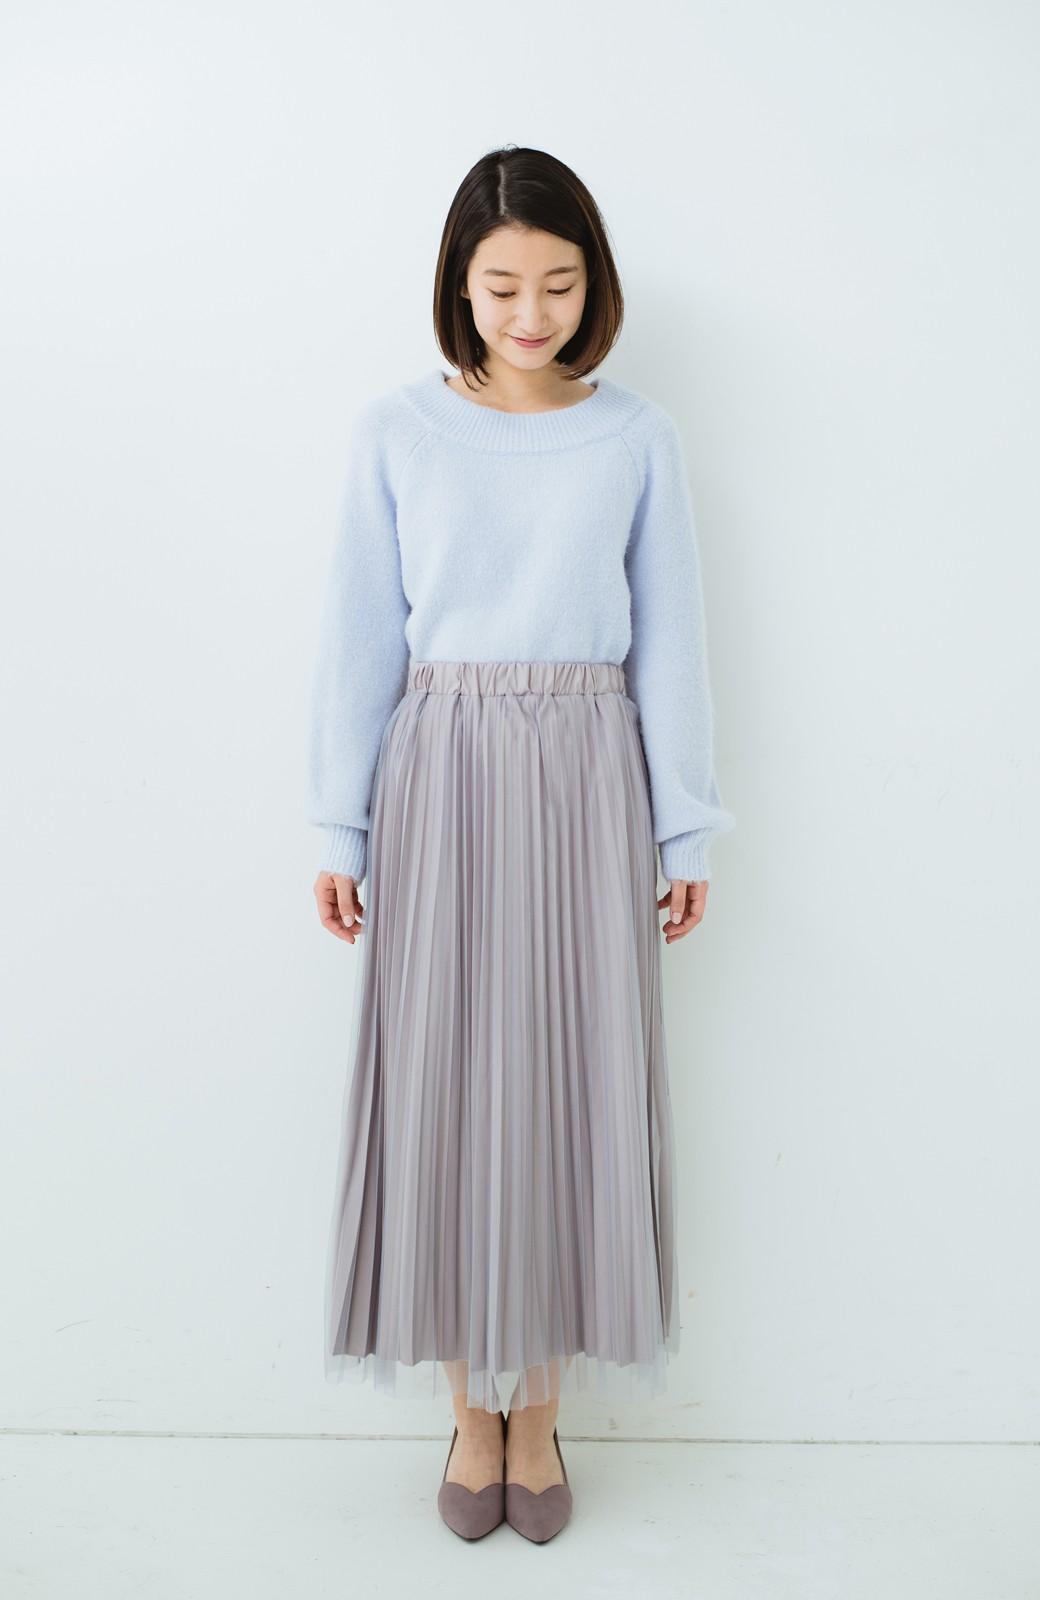 haco! どんな日も華やか気分にしてくれる 二枚仕立てのチュールプリーツスカート <ライトグレー>の商品写真10